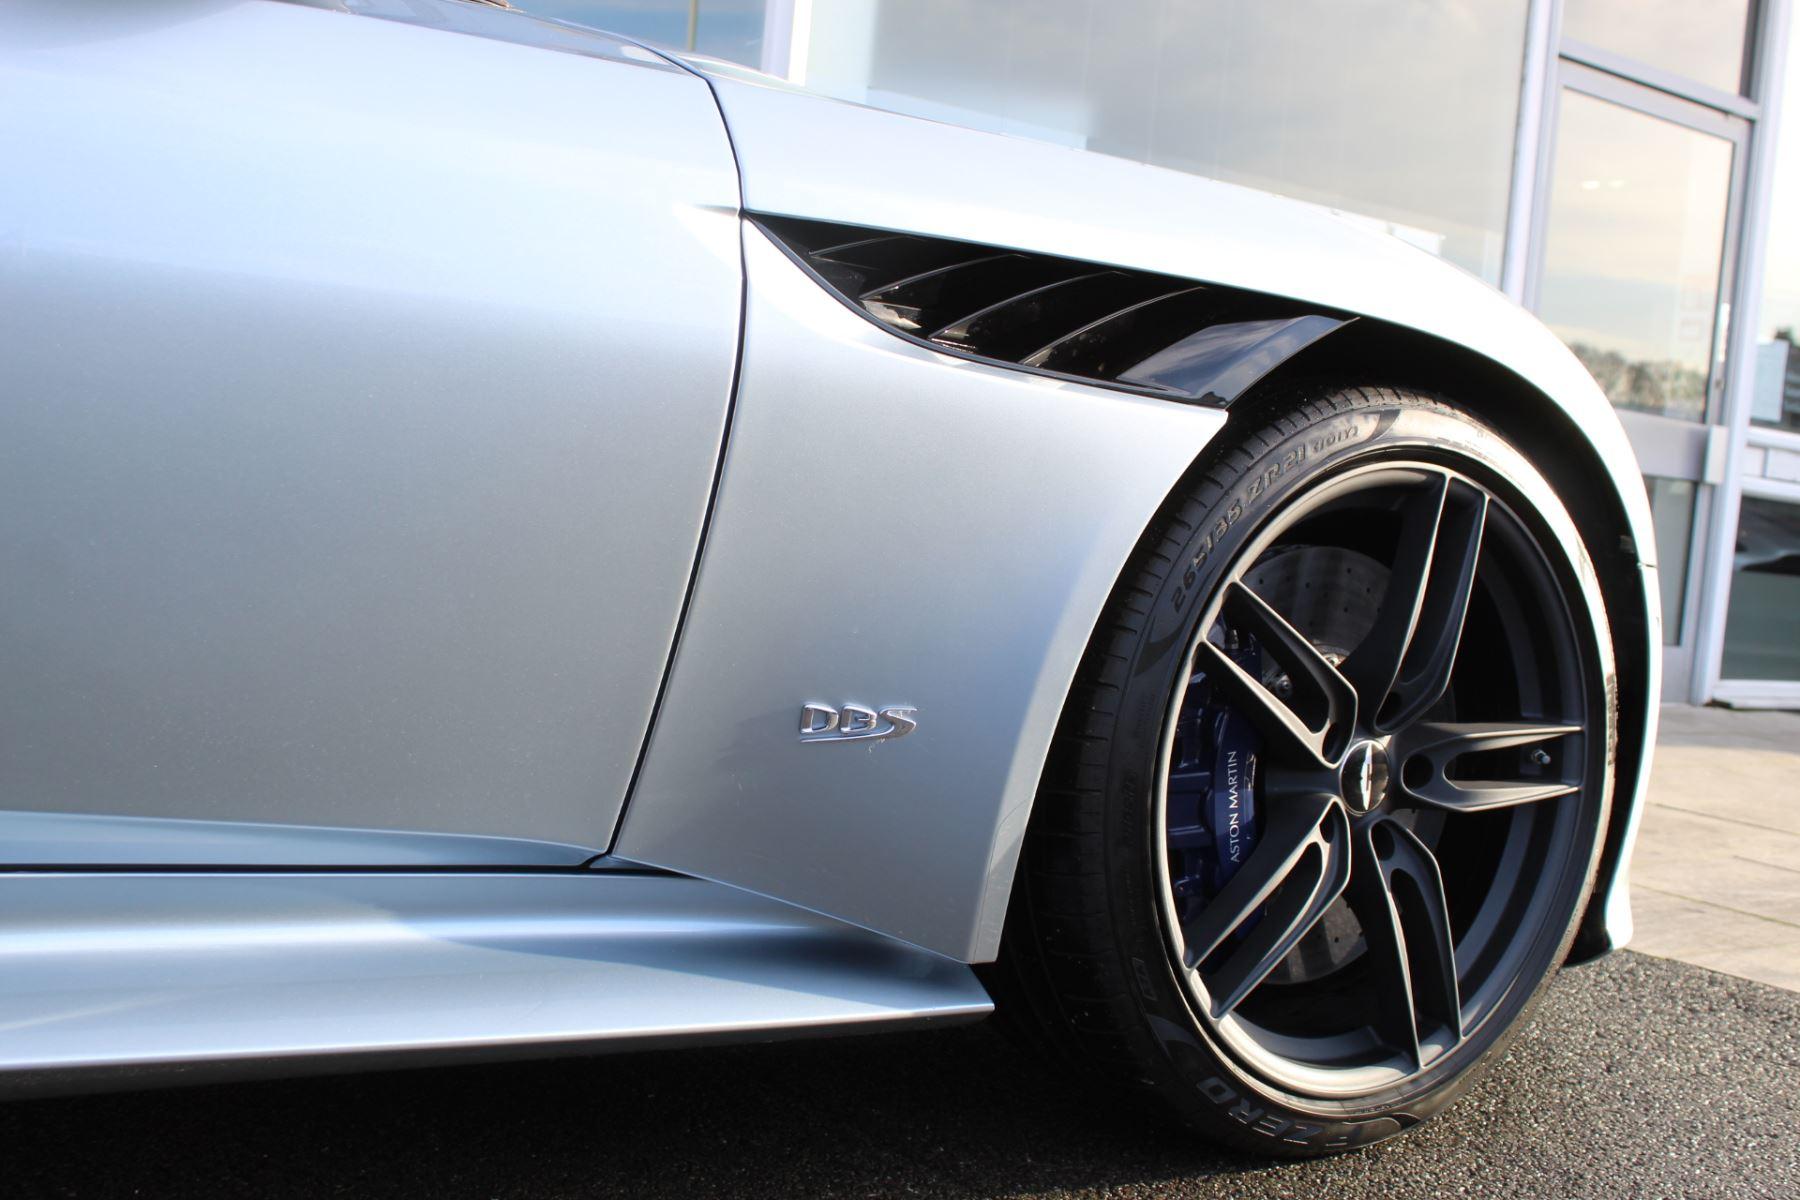 Aston Martin DBS Superleggera V12 2dr Touchtronic image 20